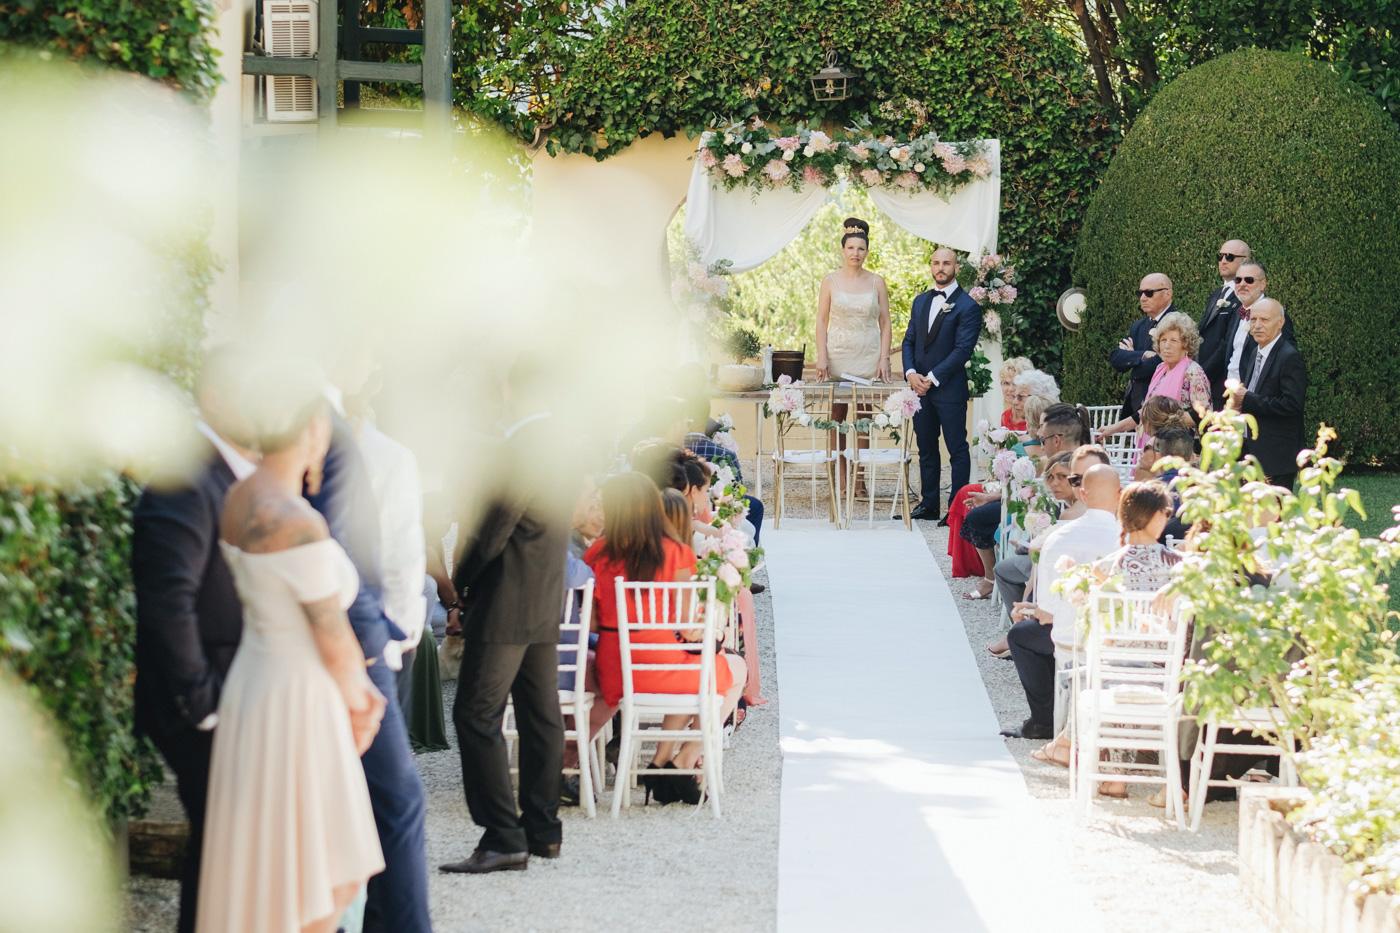 Matrimoni all'italiana wedding photographer italy-50.jpg